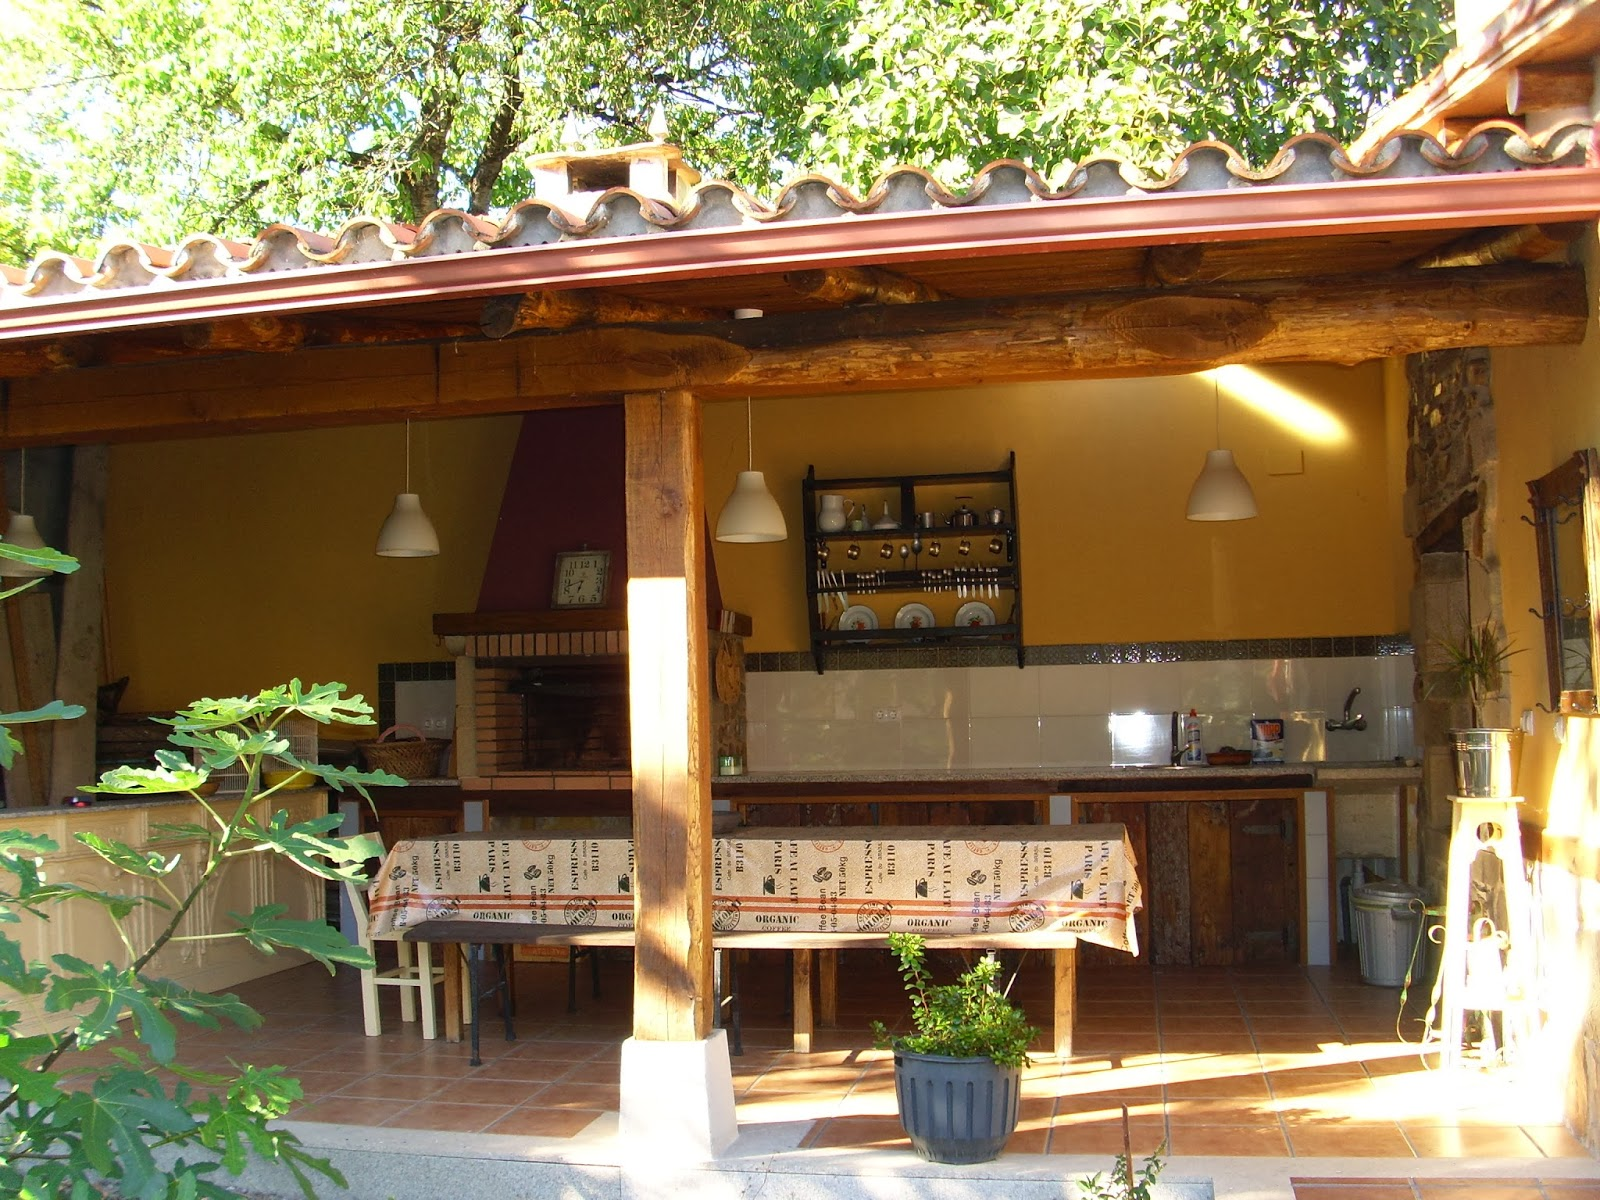 Gloria vintage porche - Porches con barbacoa ...